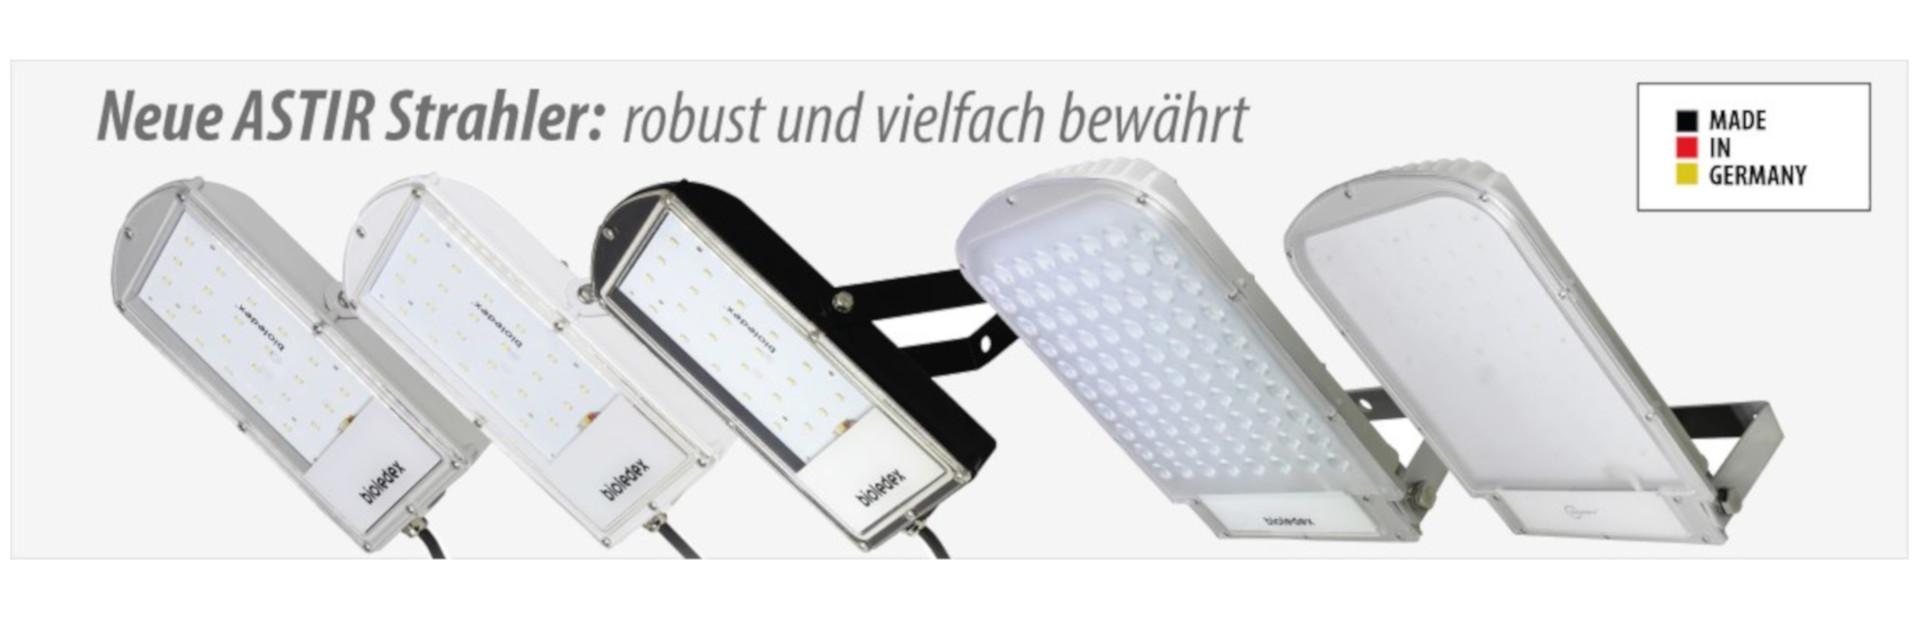 Licht & Elektro